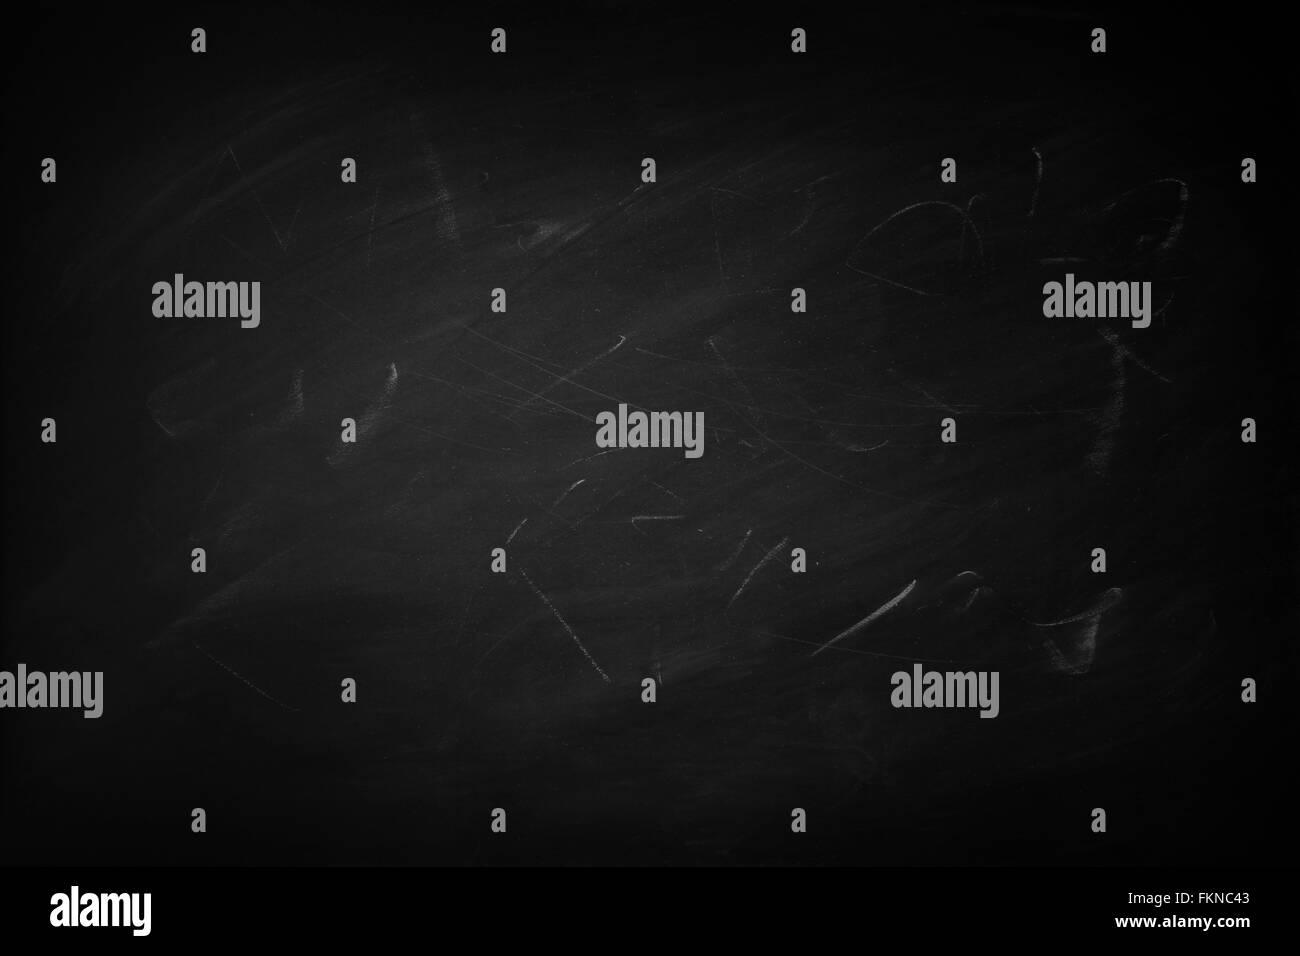 Chalk marks on a blackboard - Stock Image